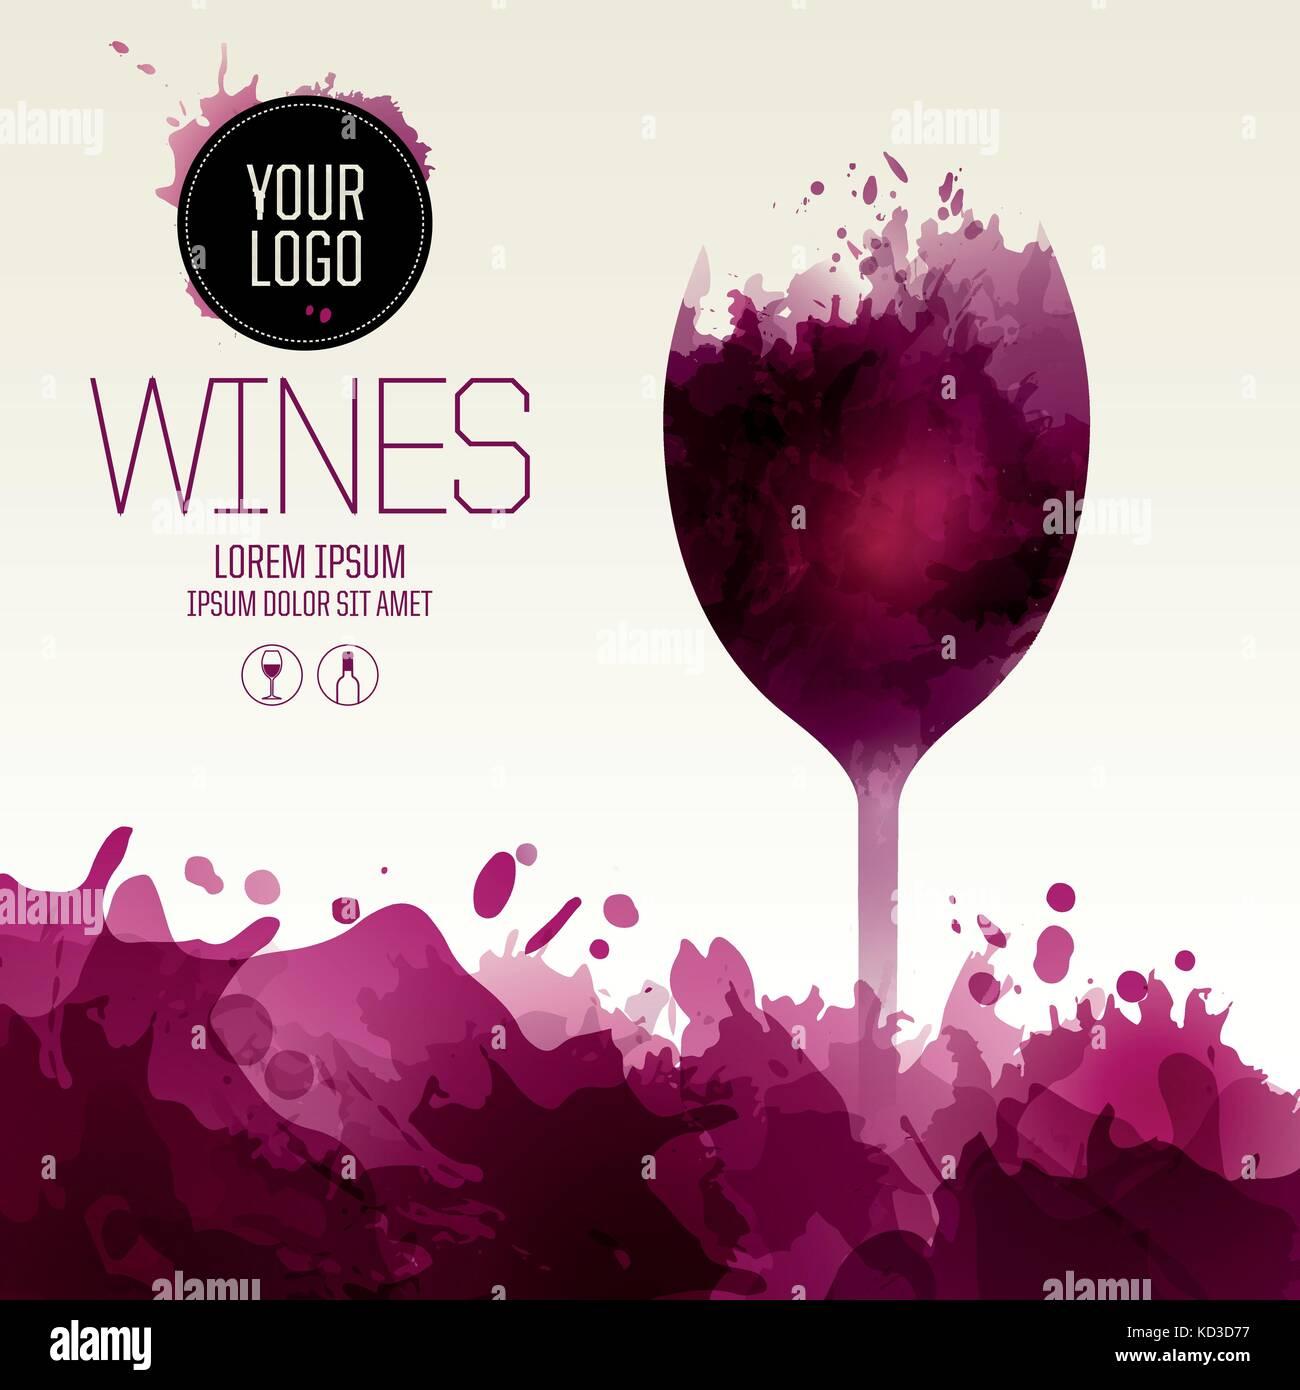 Template Design Suitable For Wine List Wine Tasting Invitation Or